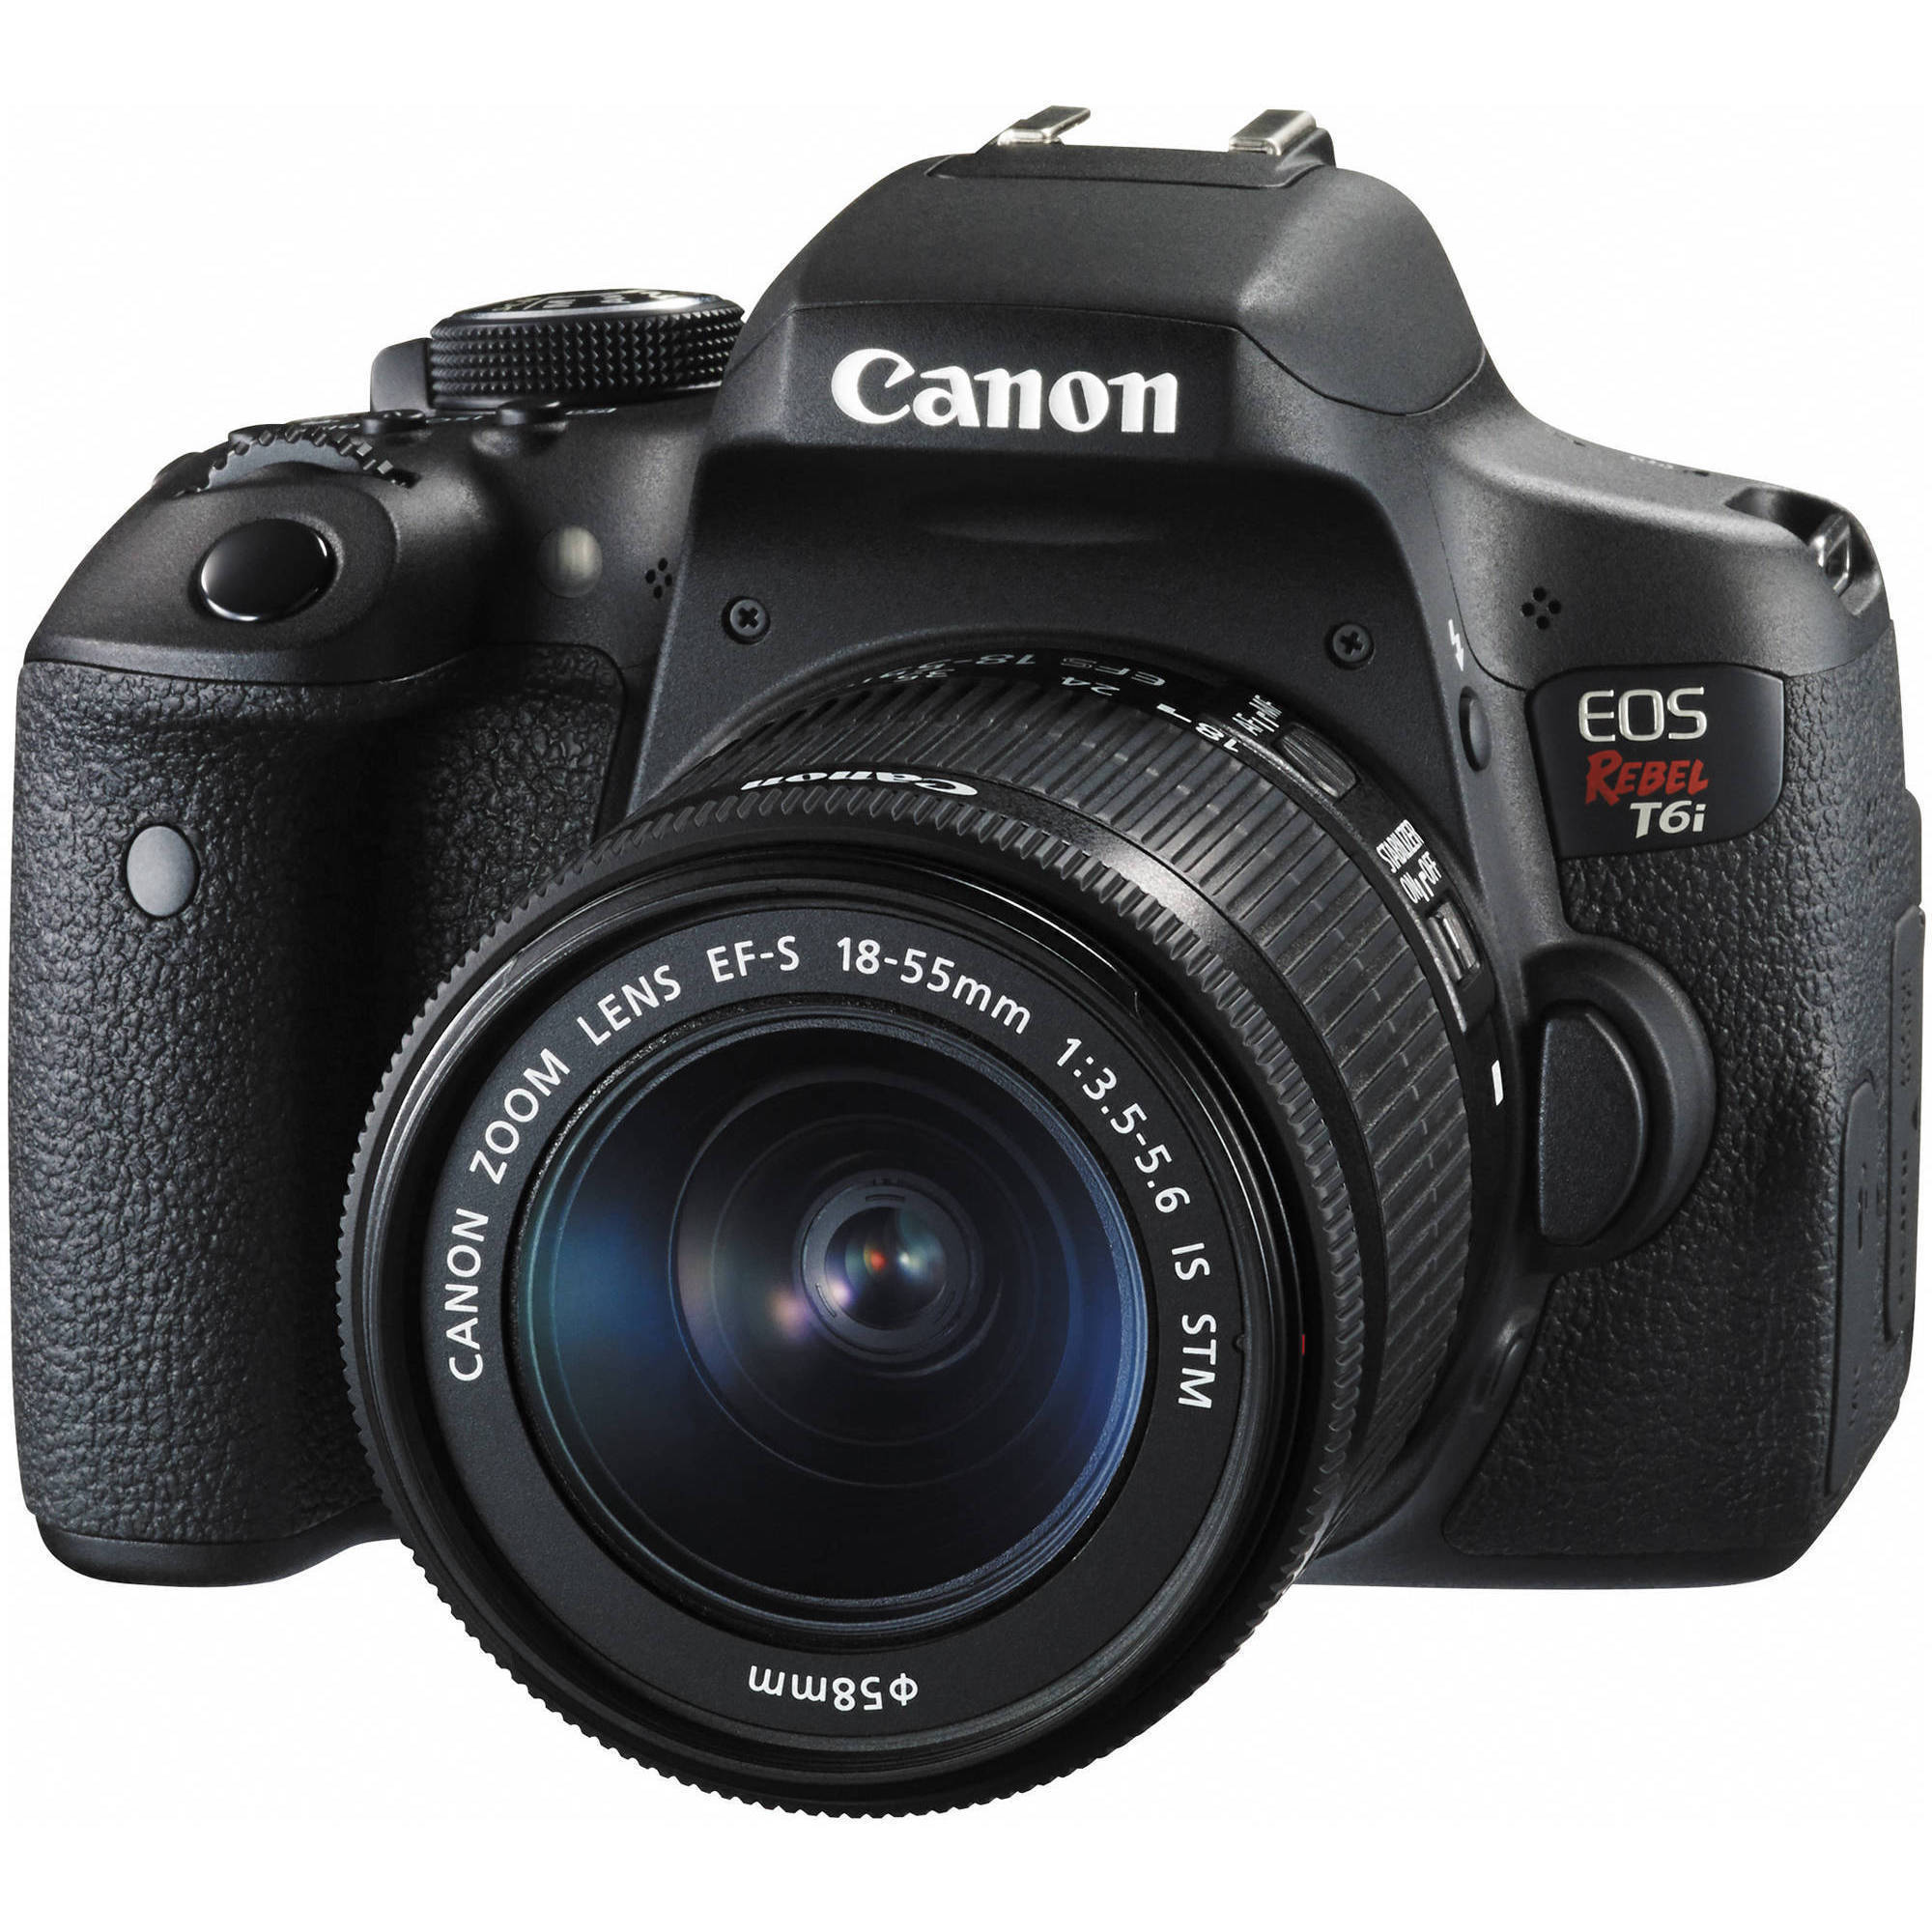 Canon Black EOS Rebel T6i Digital SLR Camera with 24.2 Megapixels and 18-55mm Lens Included